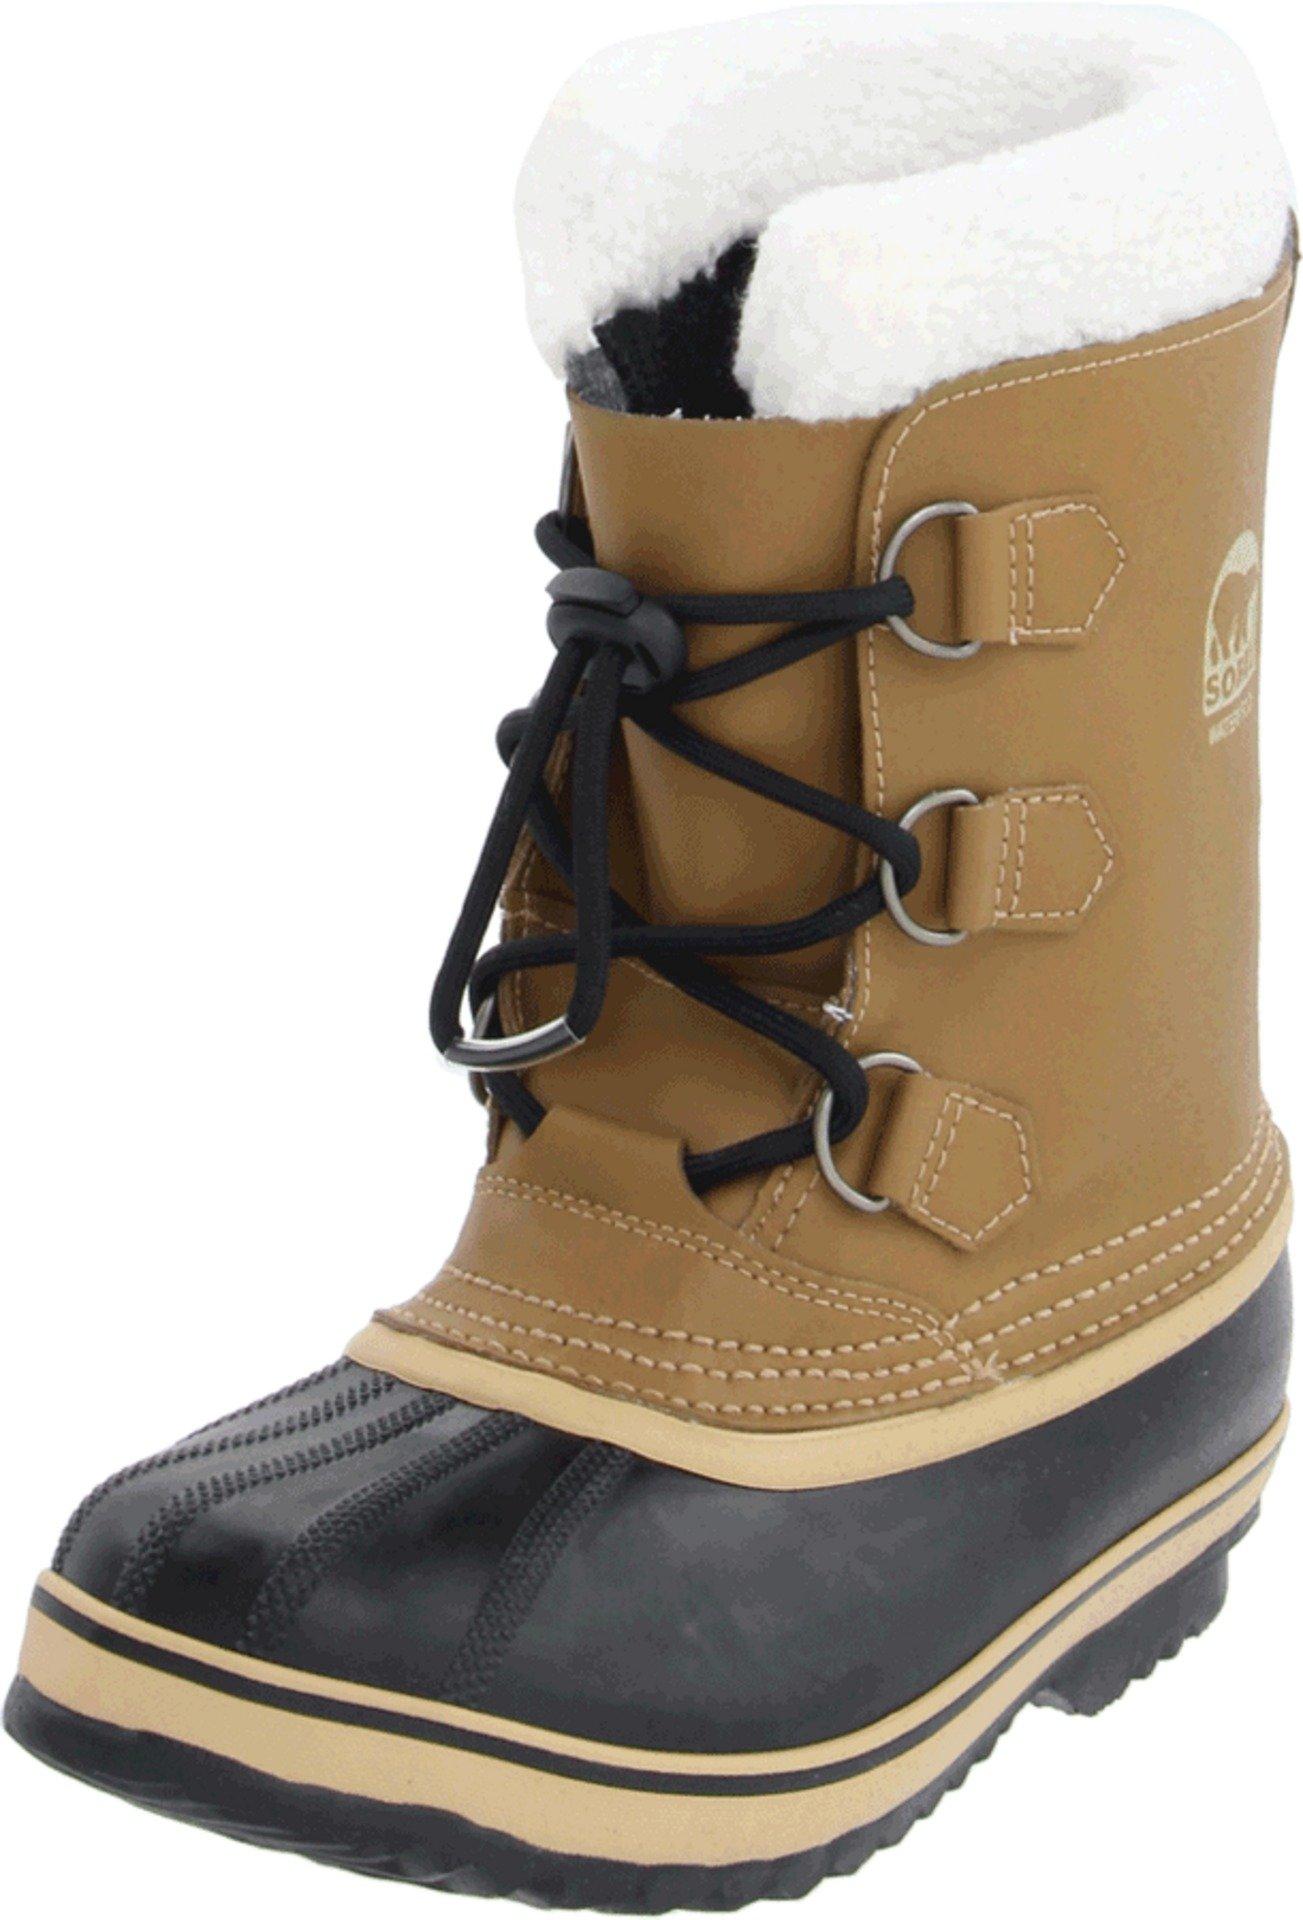 Sorel Yoot Pac Tp Winter Boot,Mesquite,2 M US Little Kid by SOREL